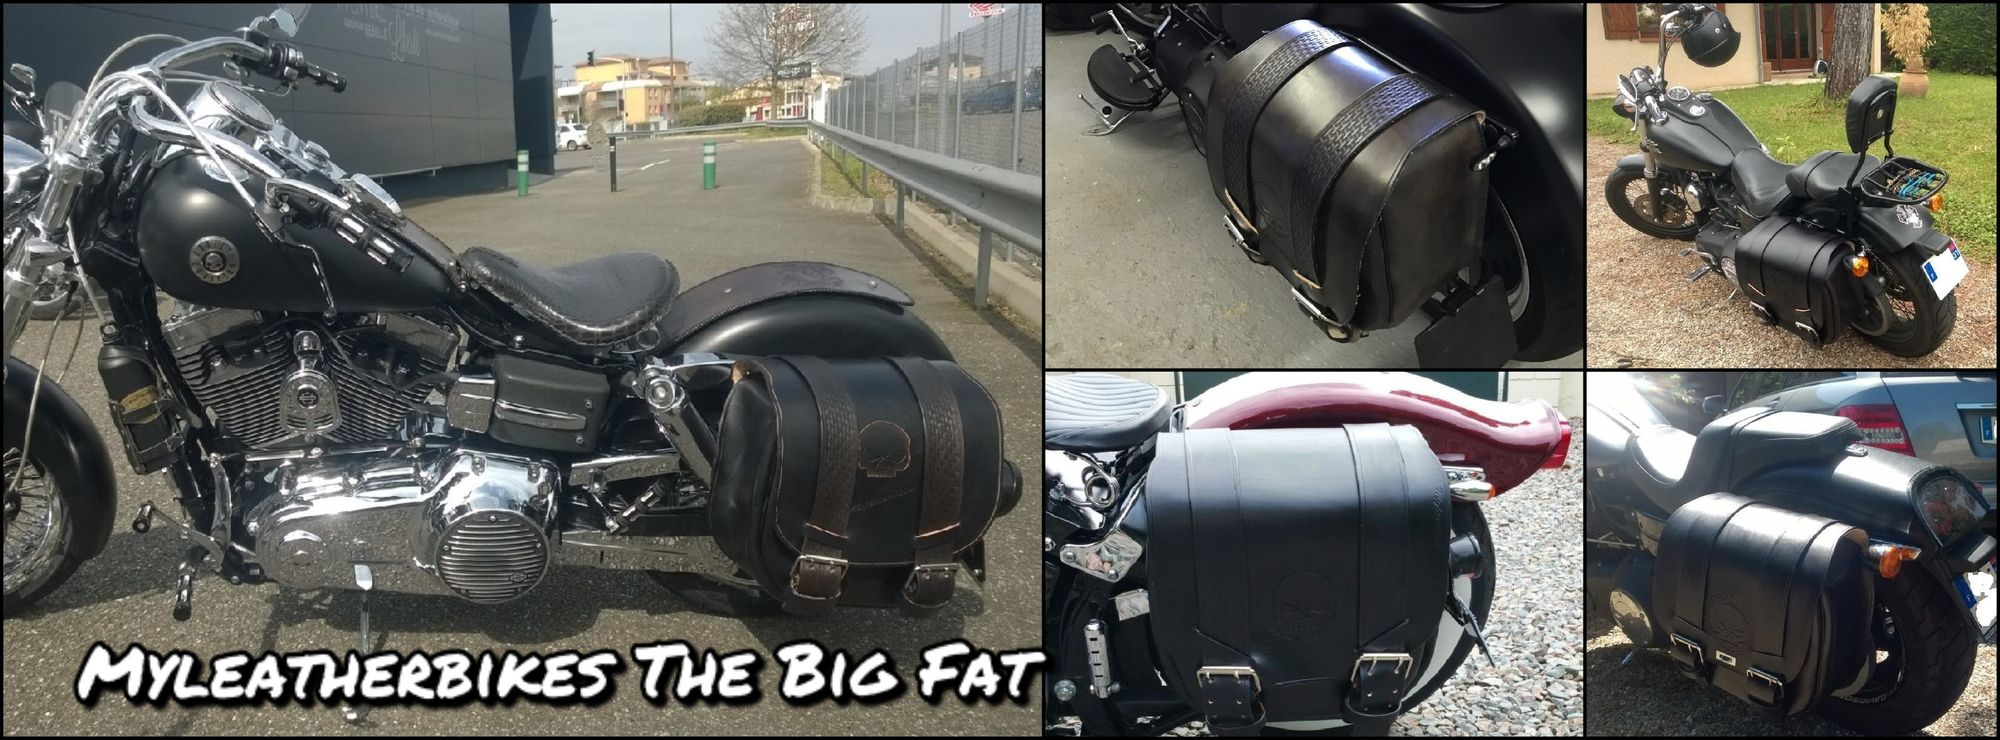 sacoche big fat harley